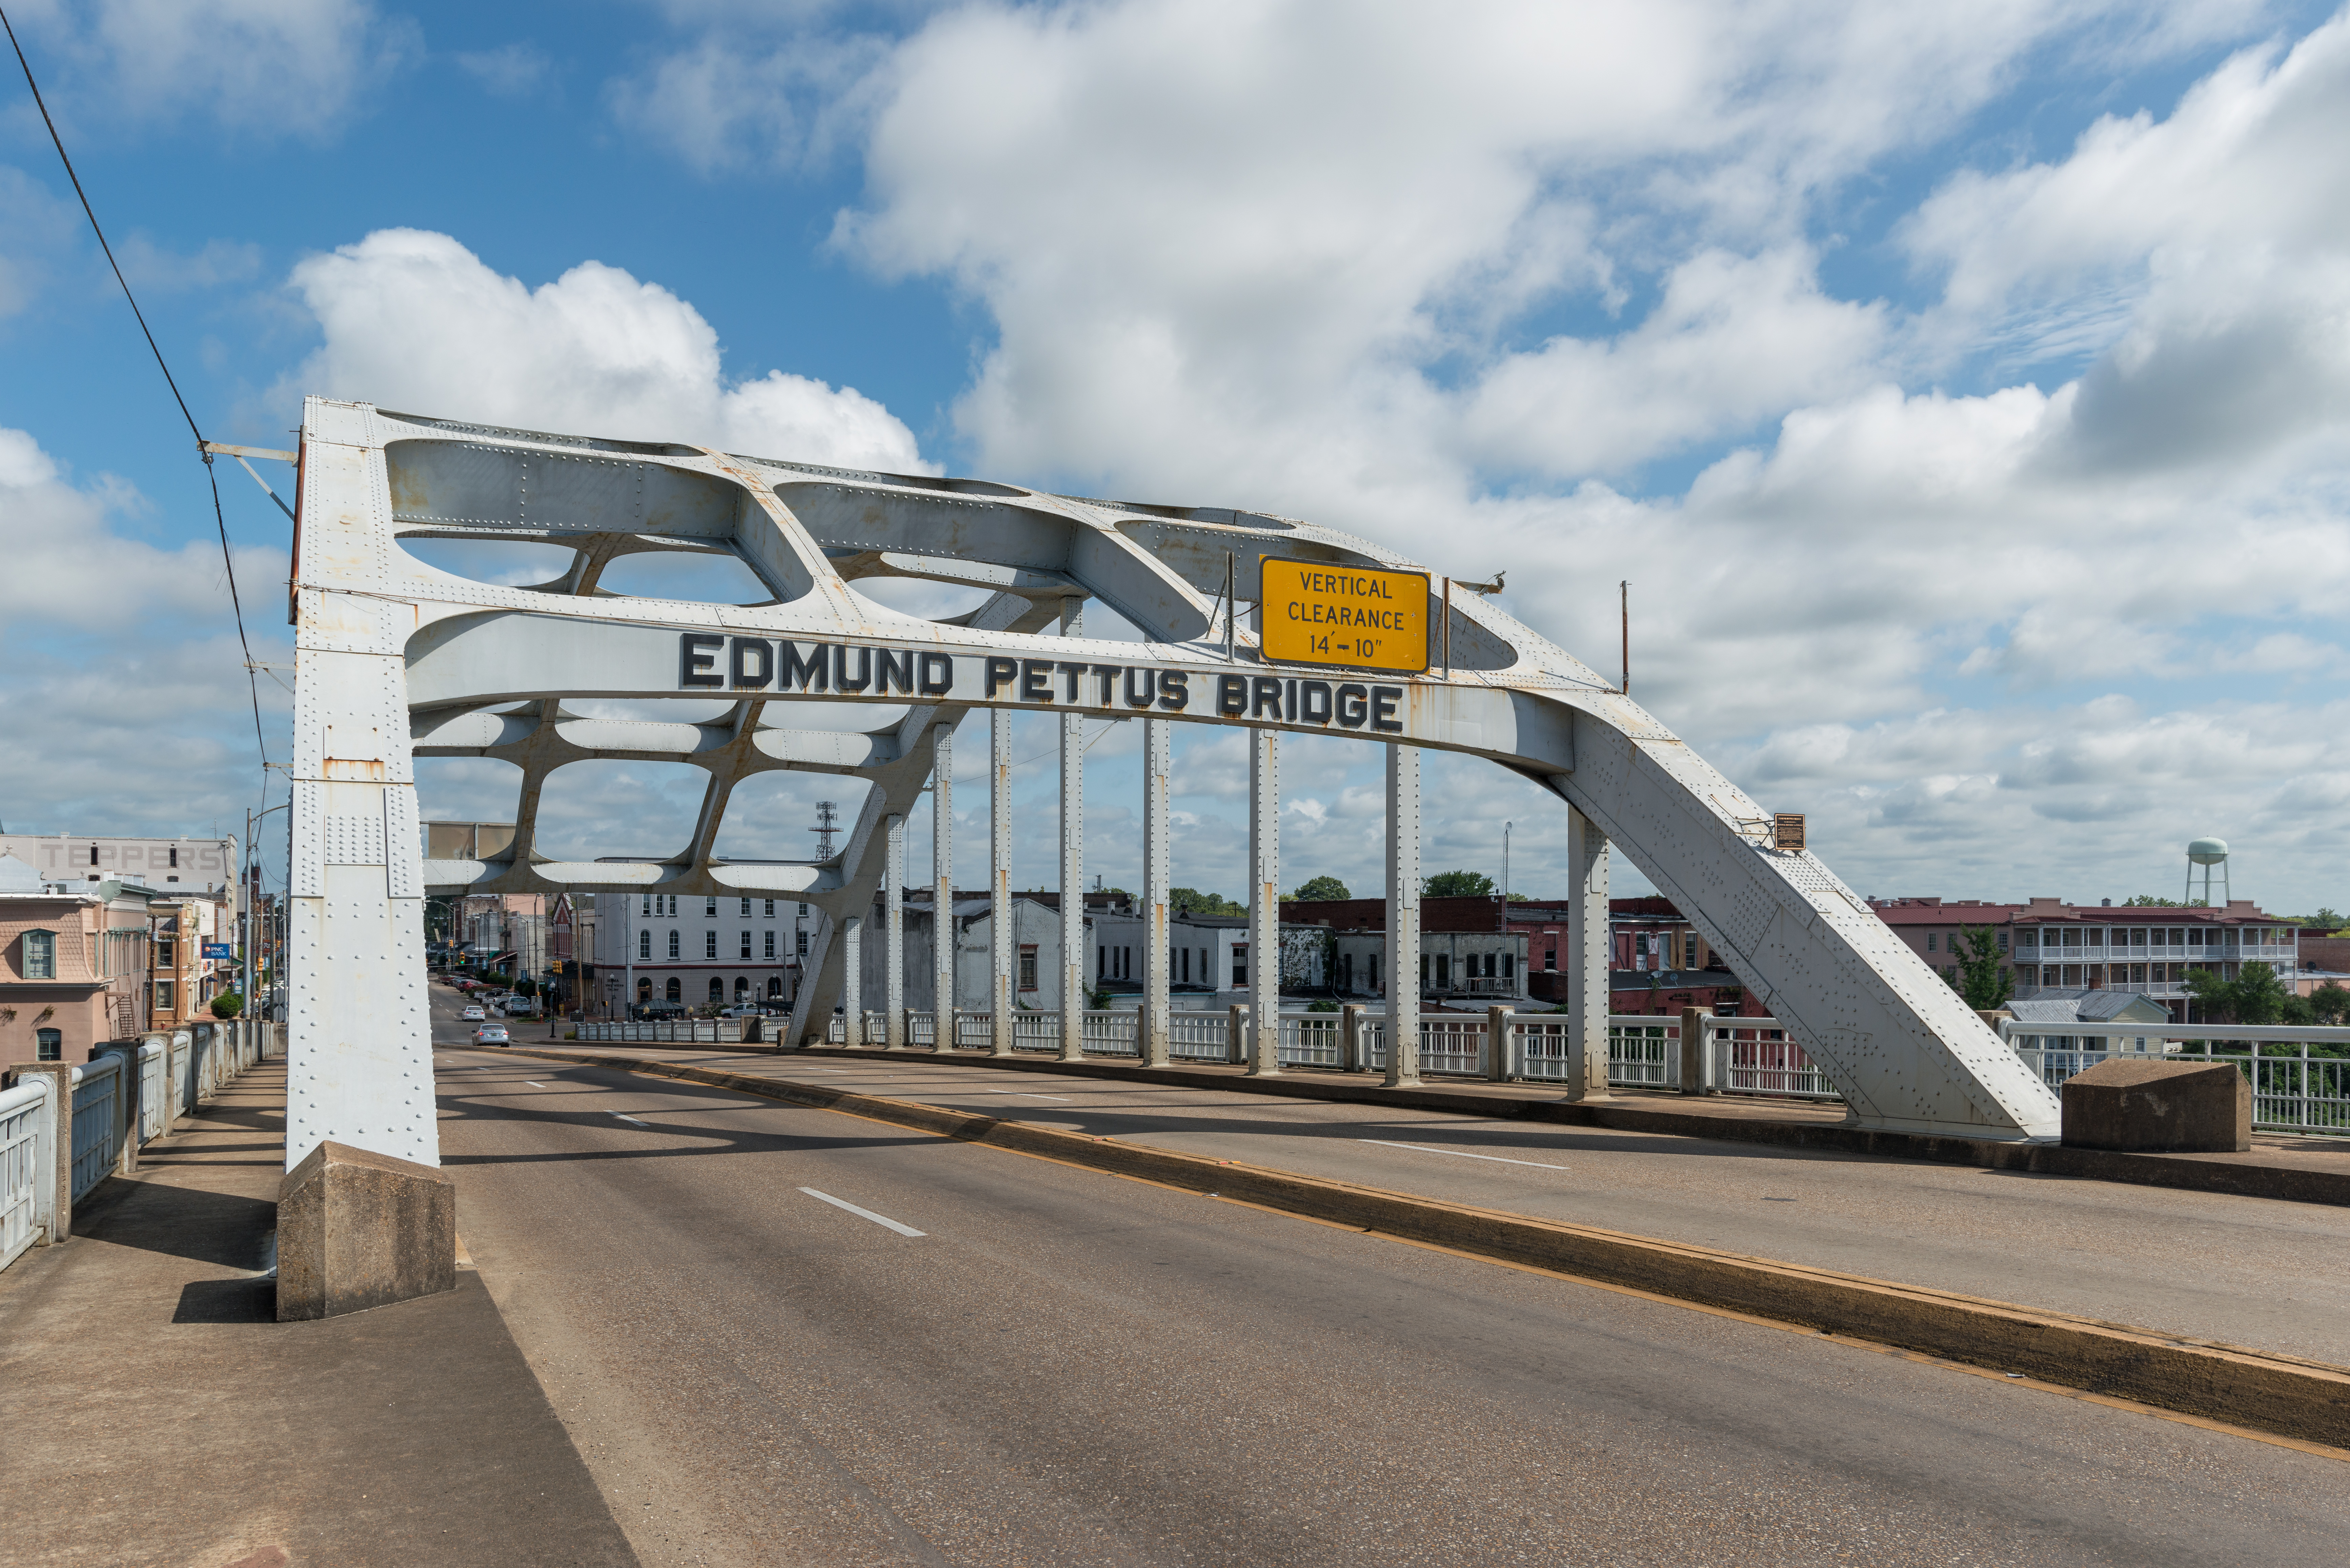 South view of Arch of Edmund Pettus Bridge Selma AL 1